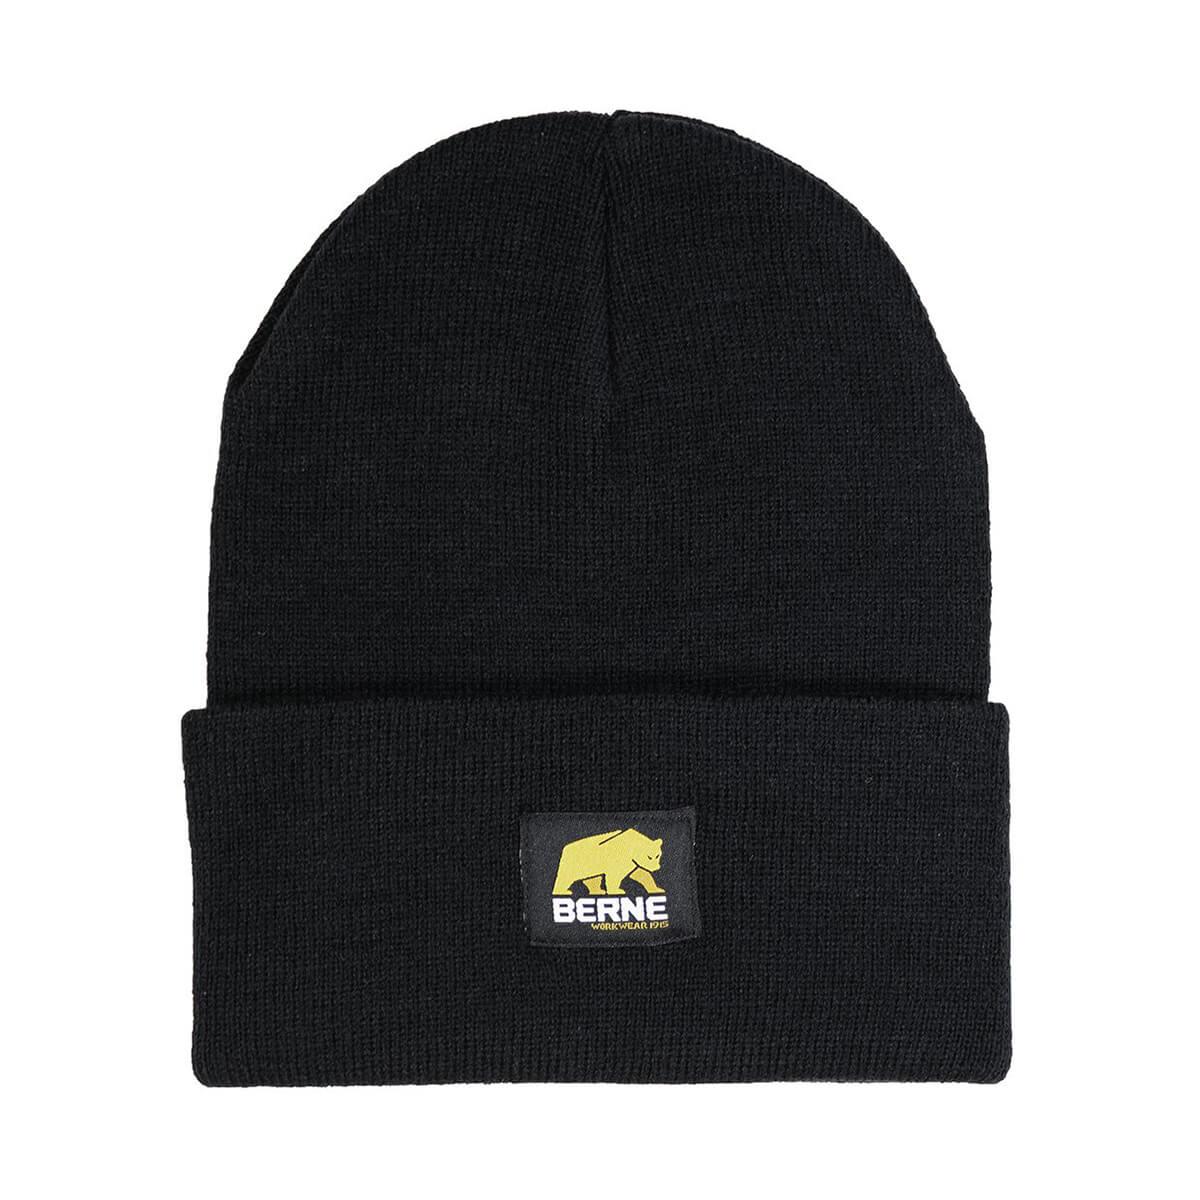 Heritage Knit Cuff Cap - Black